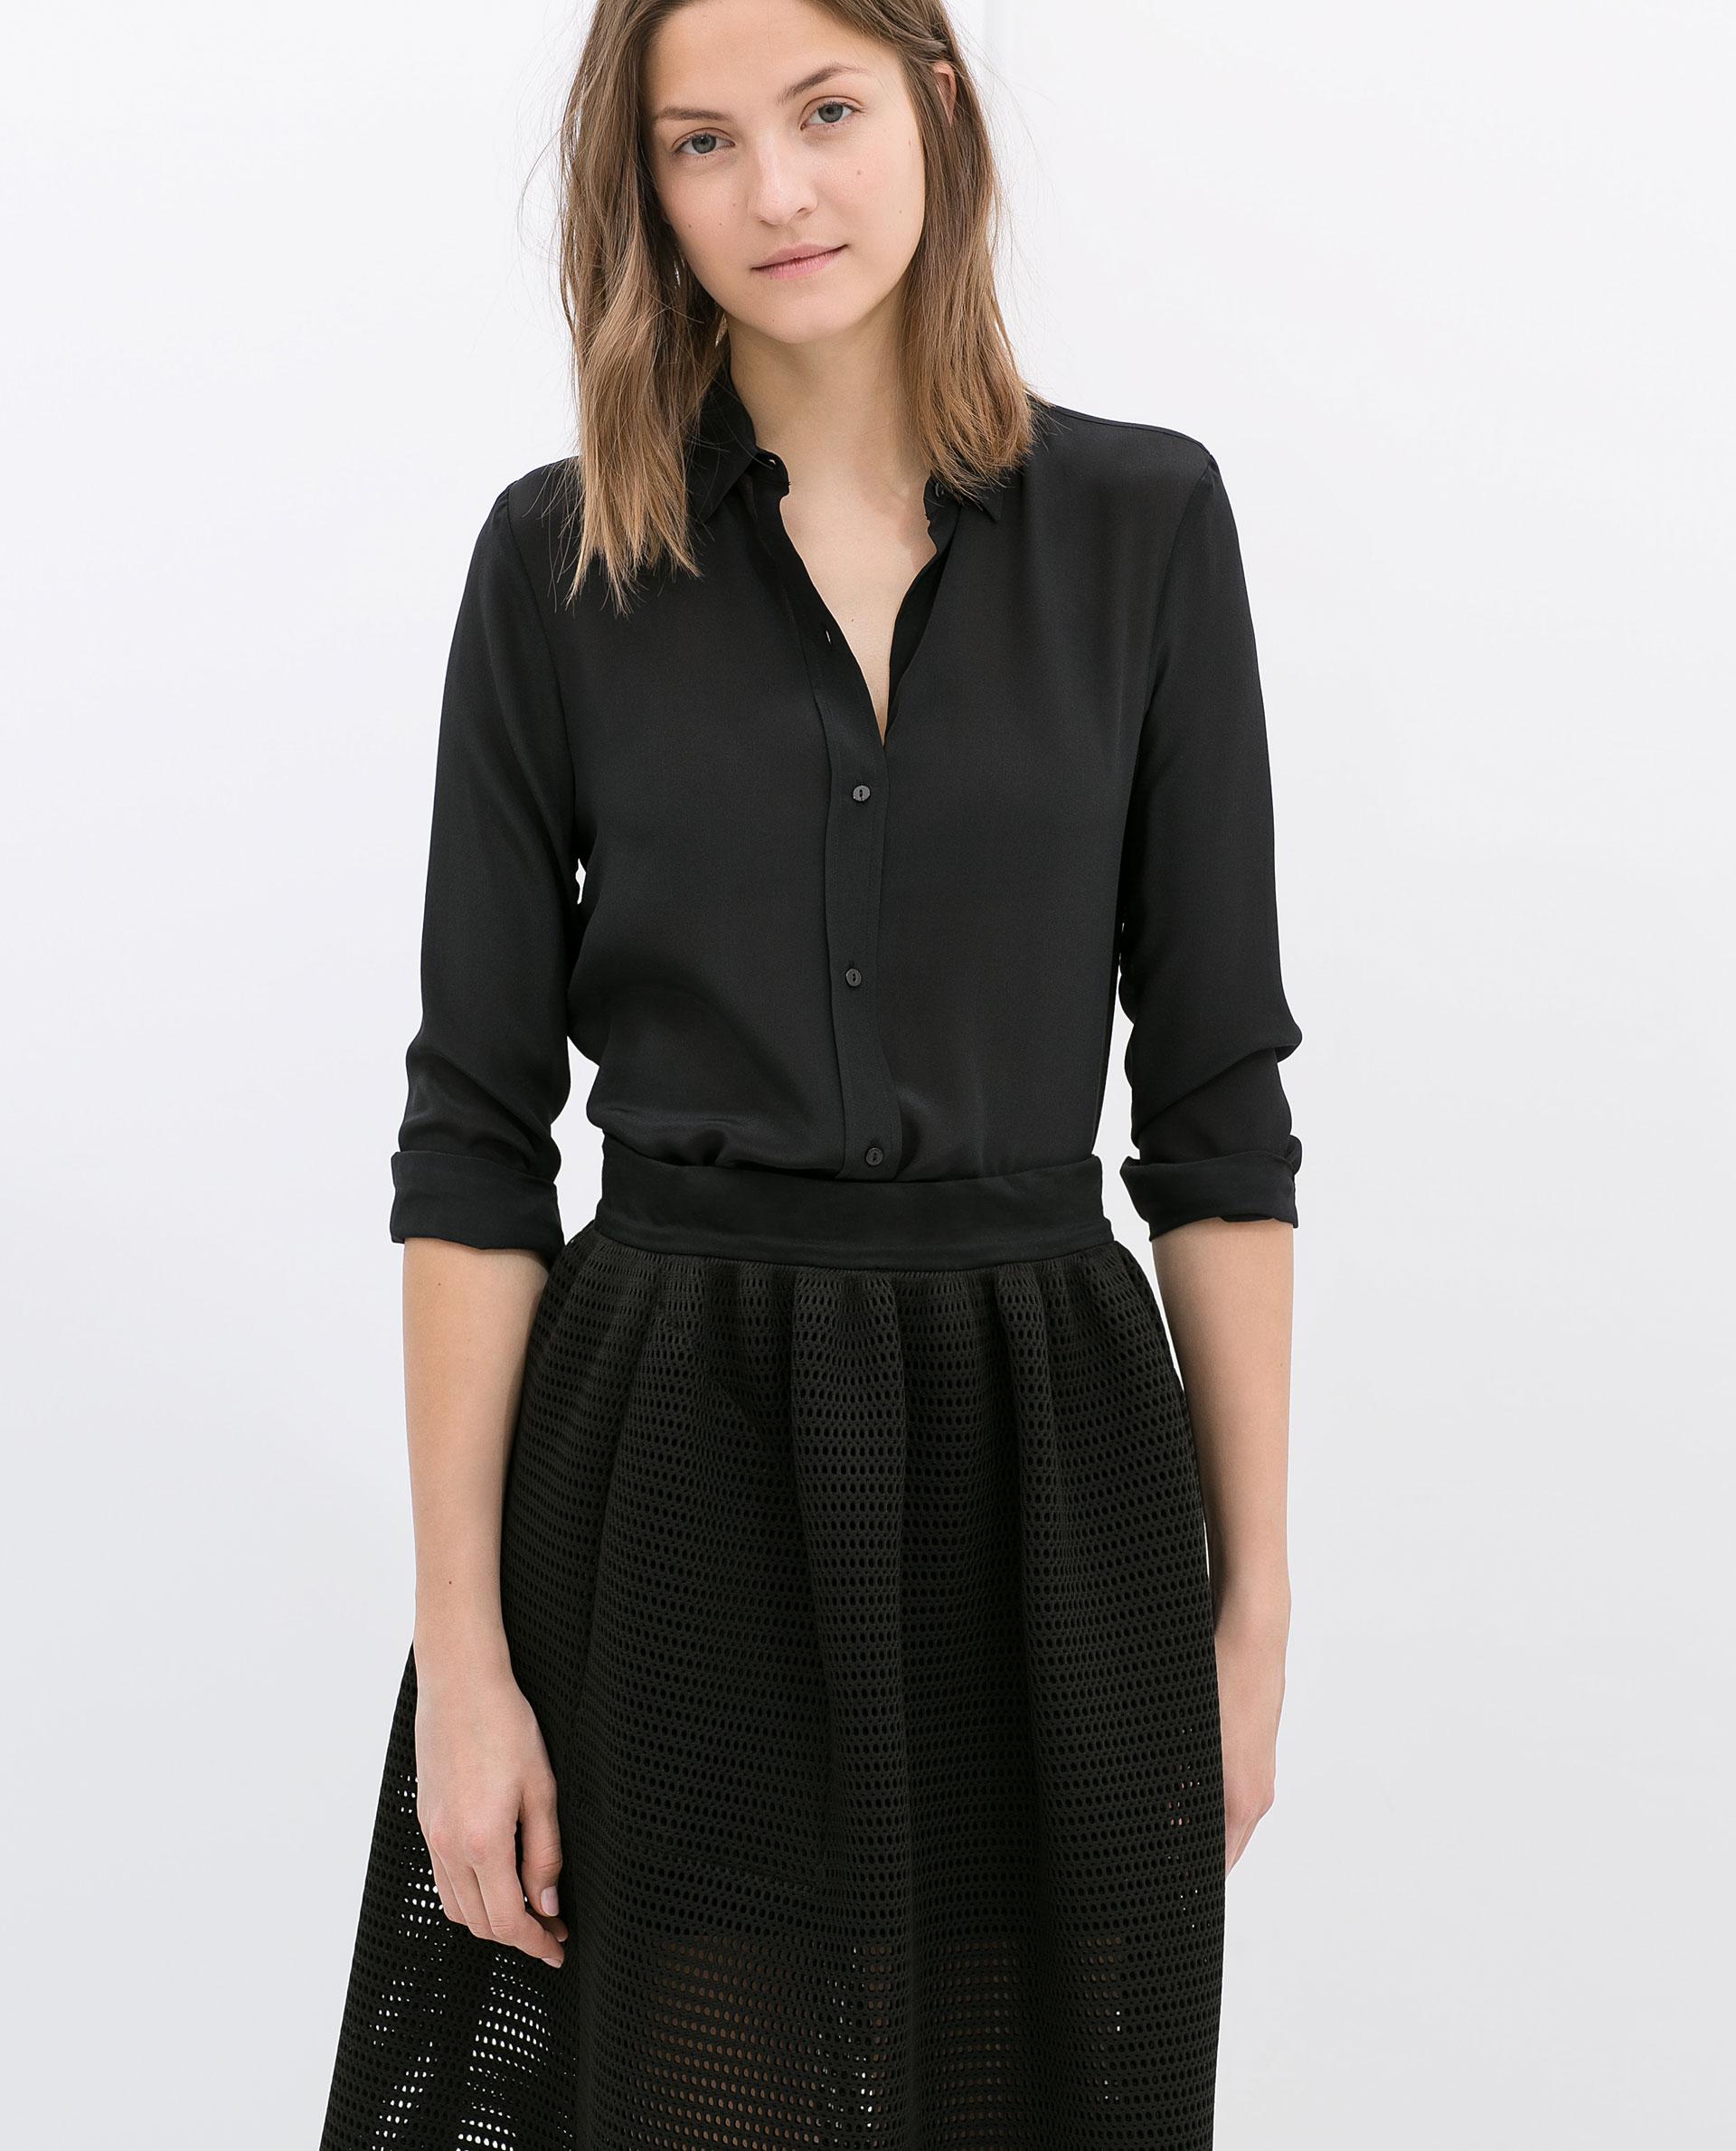 Zara Online Blouse 108